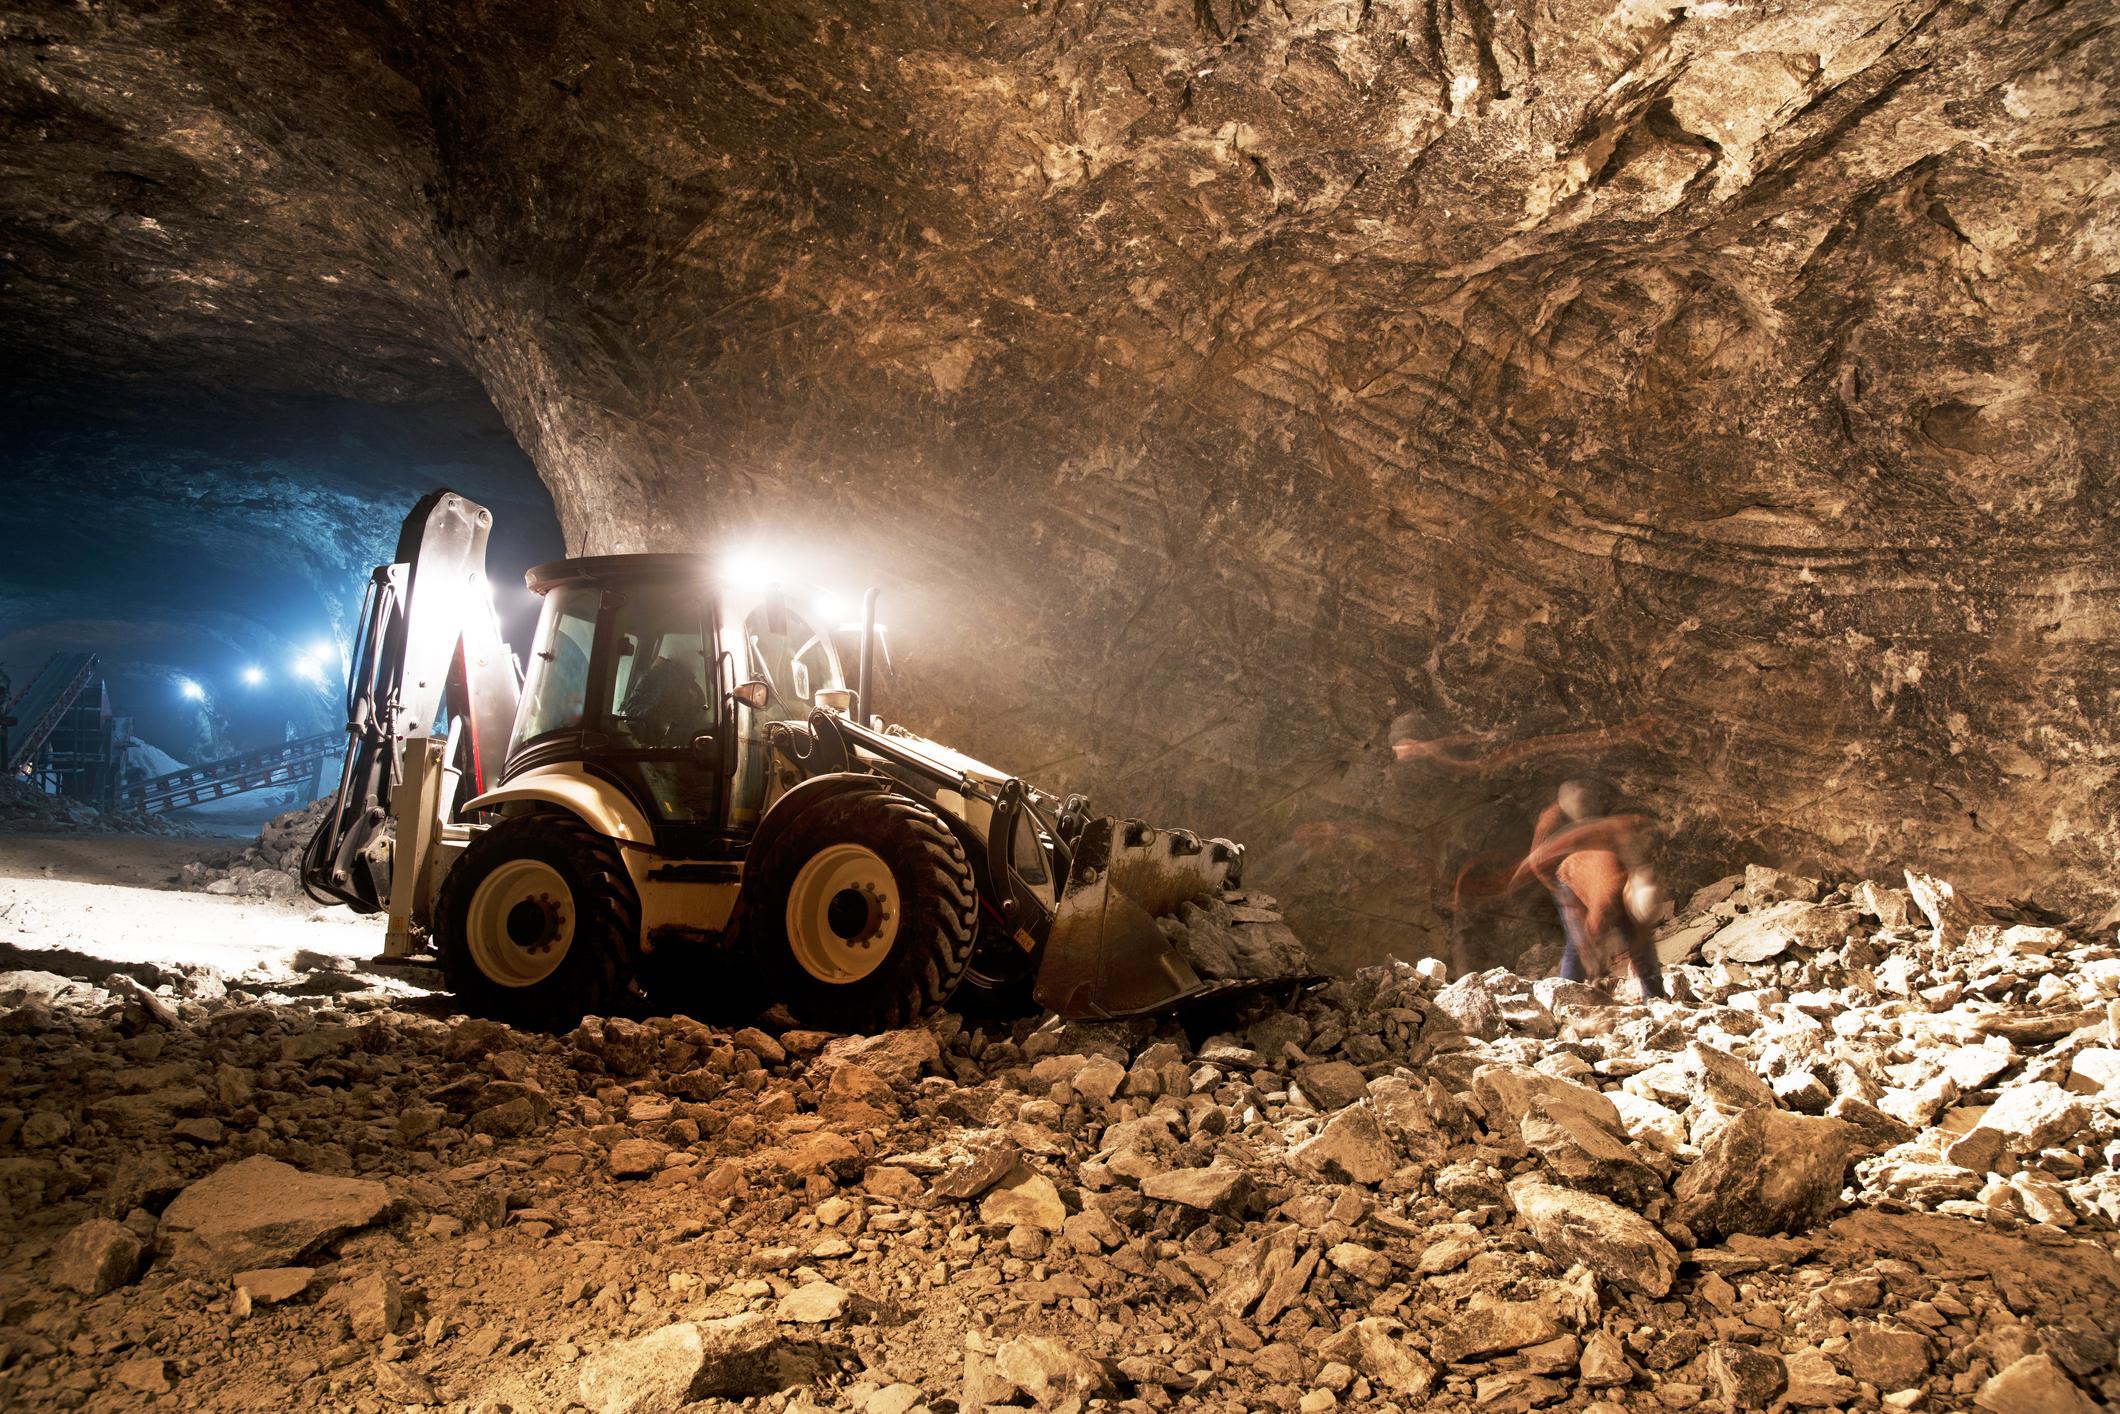 An underground excavator operating in a precious-metal mine.